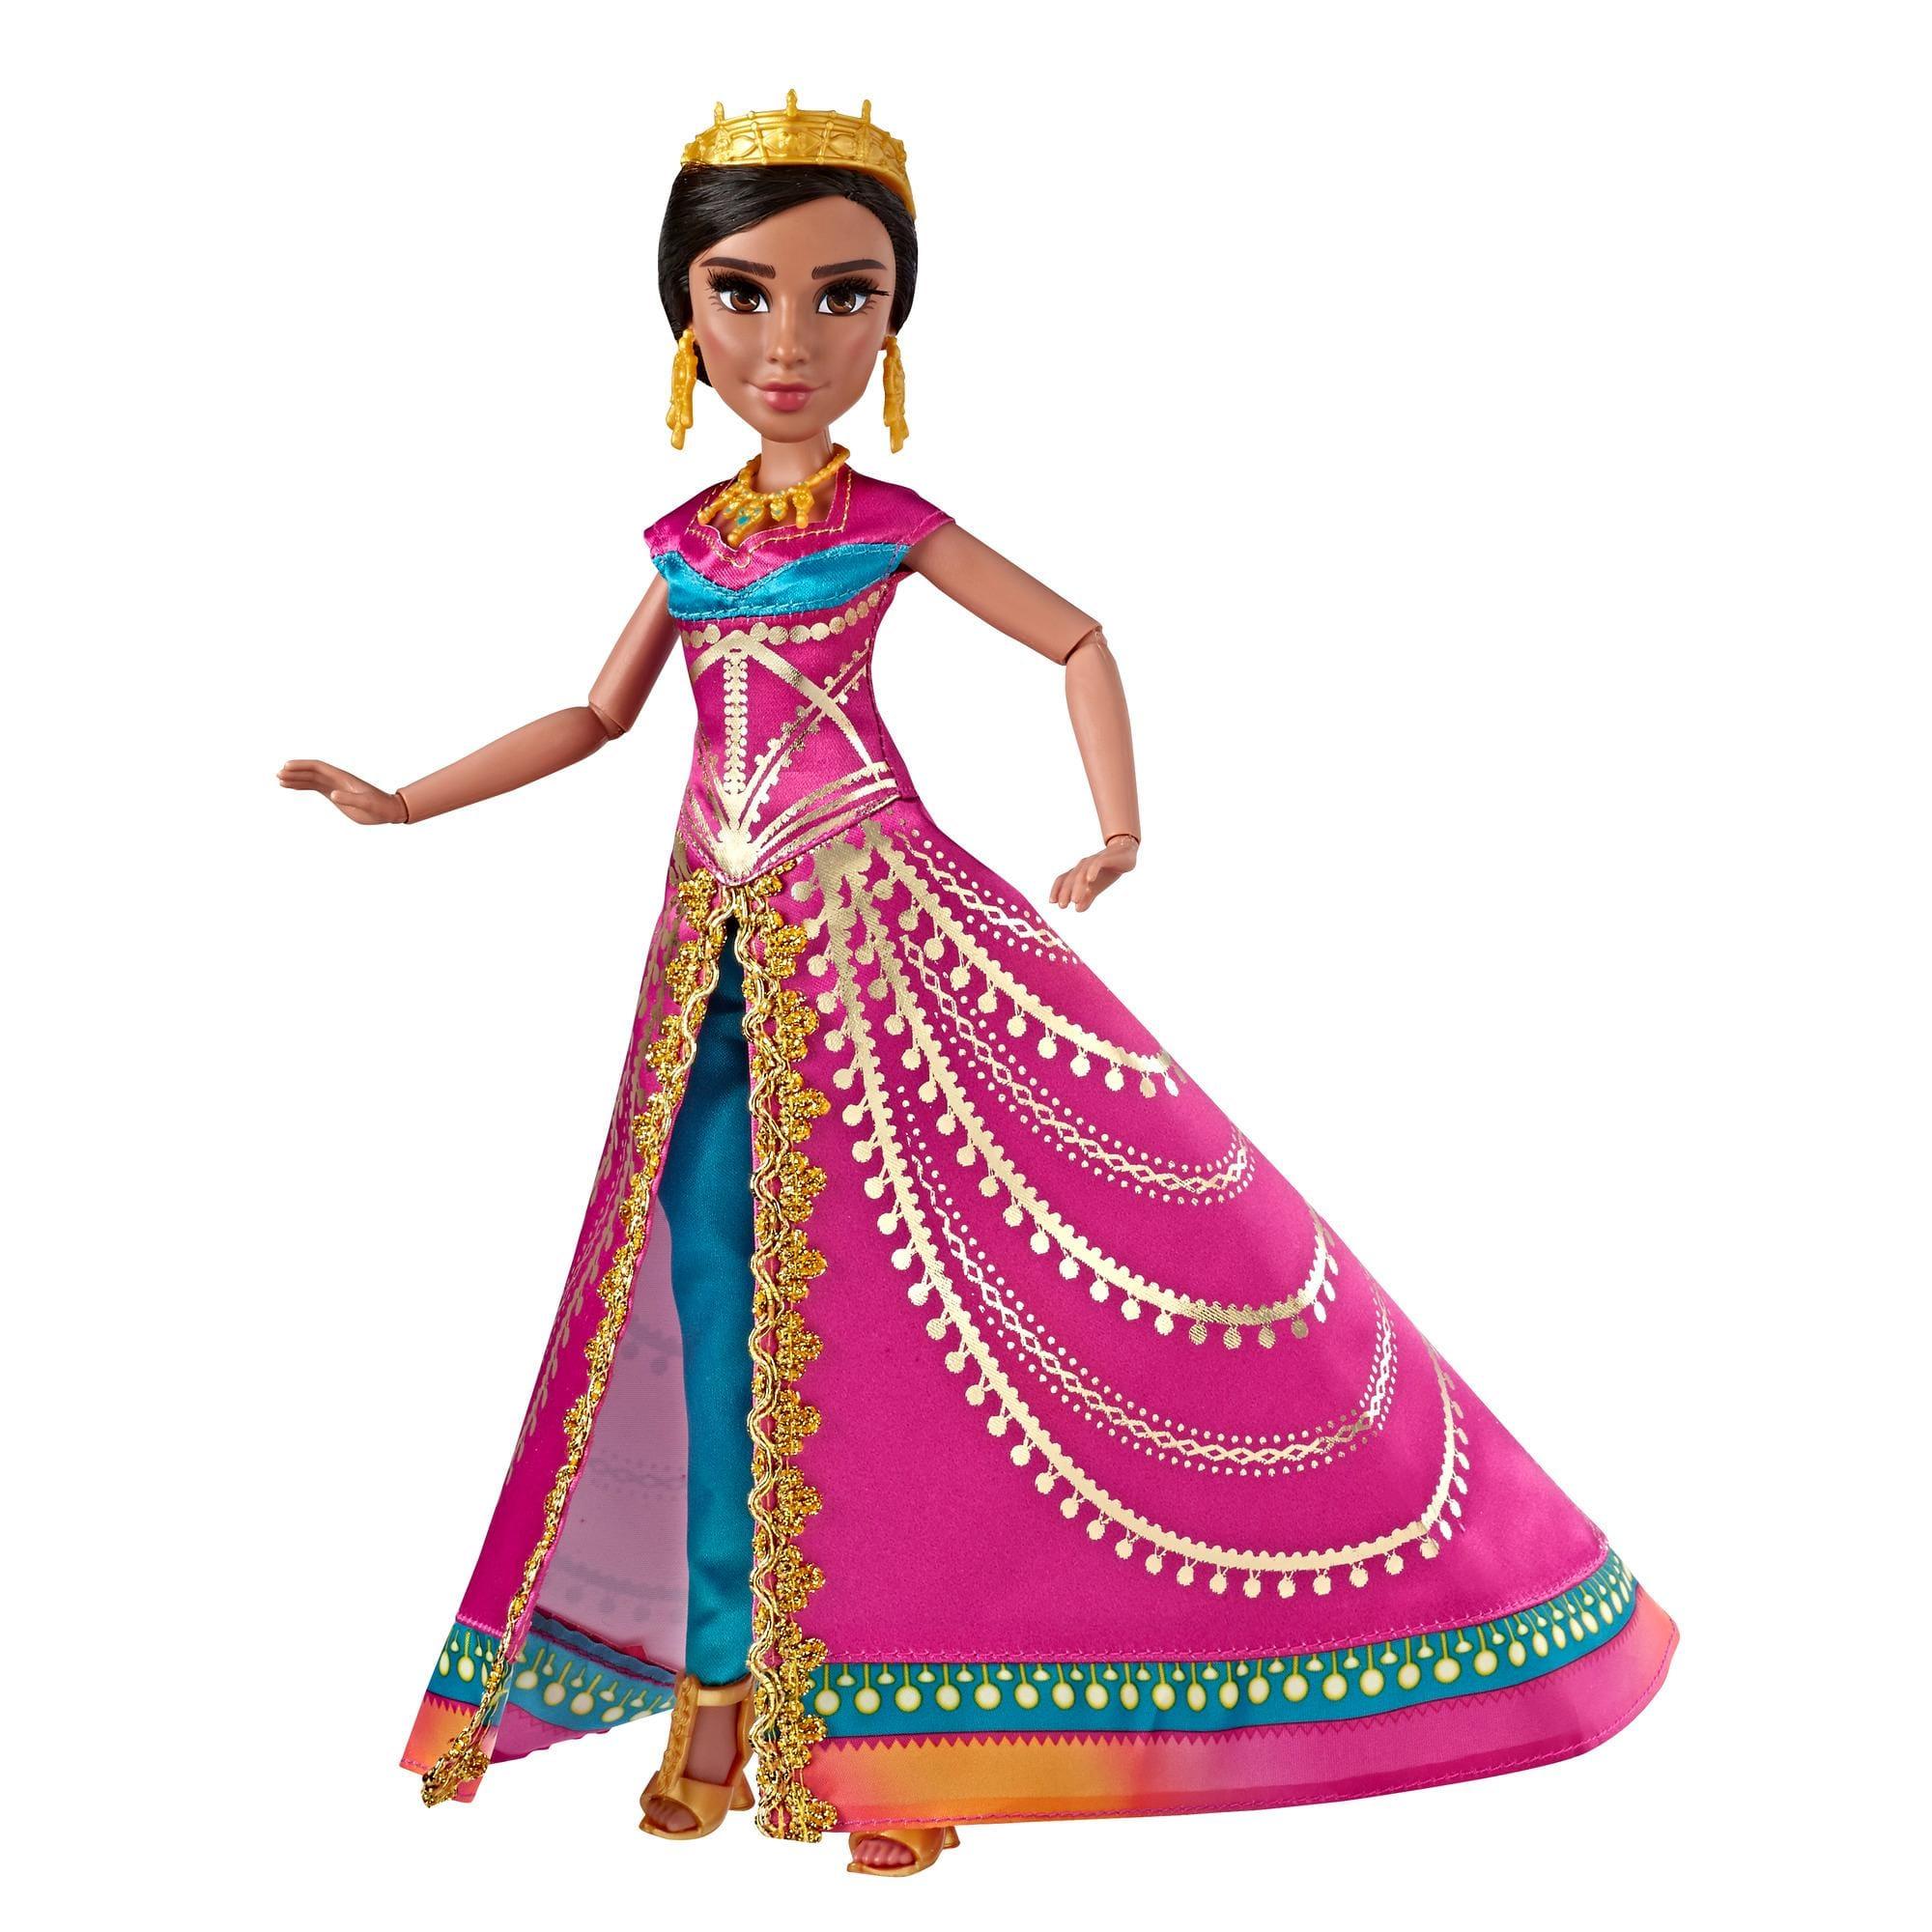 A Closer Look At Disney Aladdin Glamorous Jasmine Deluxe Fashion